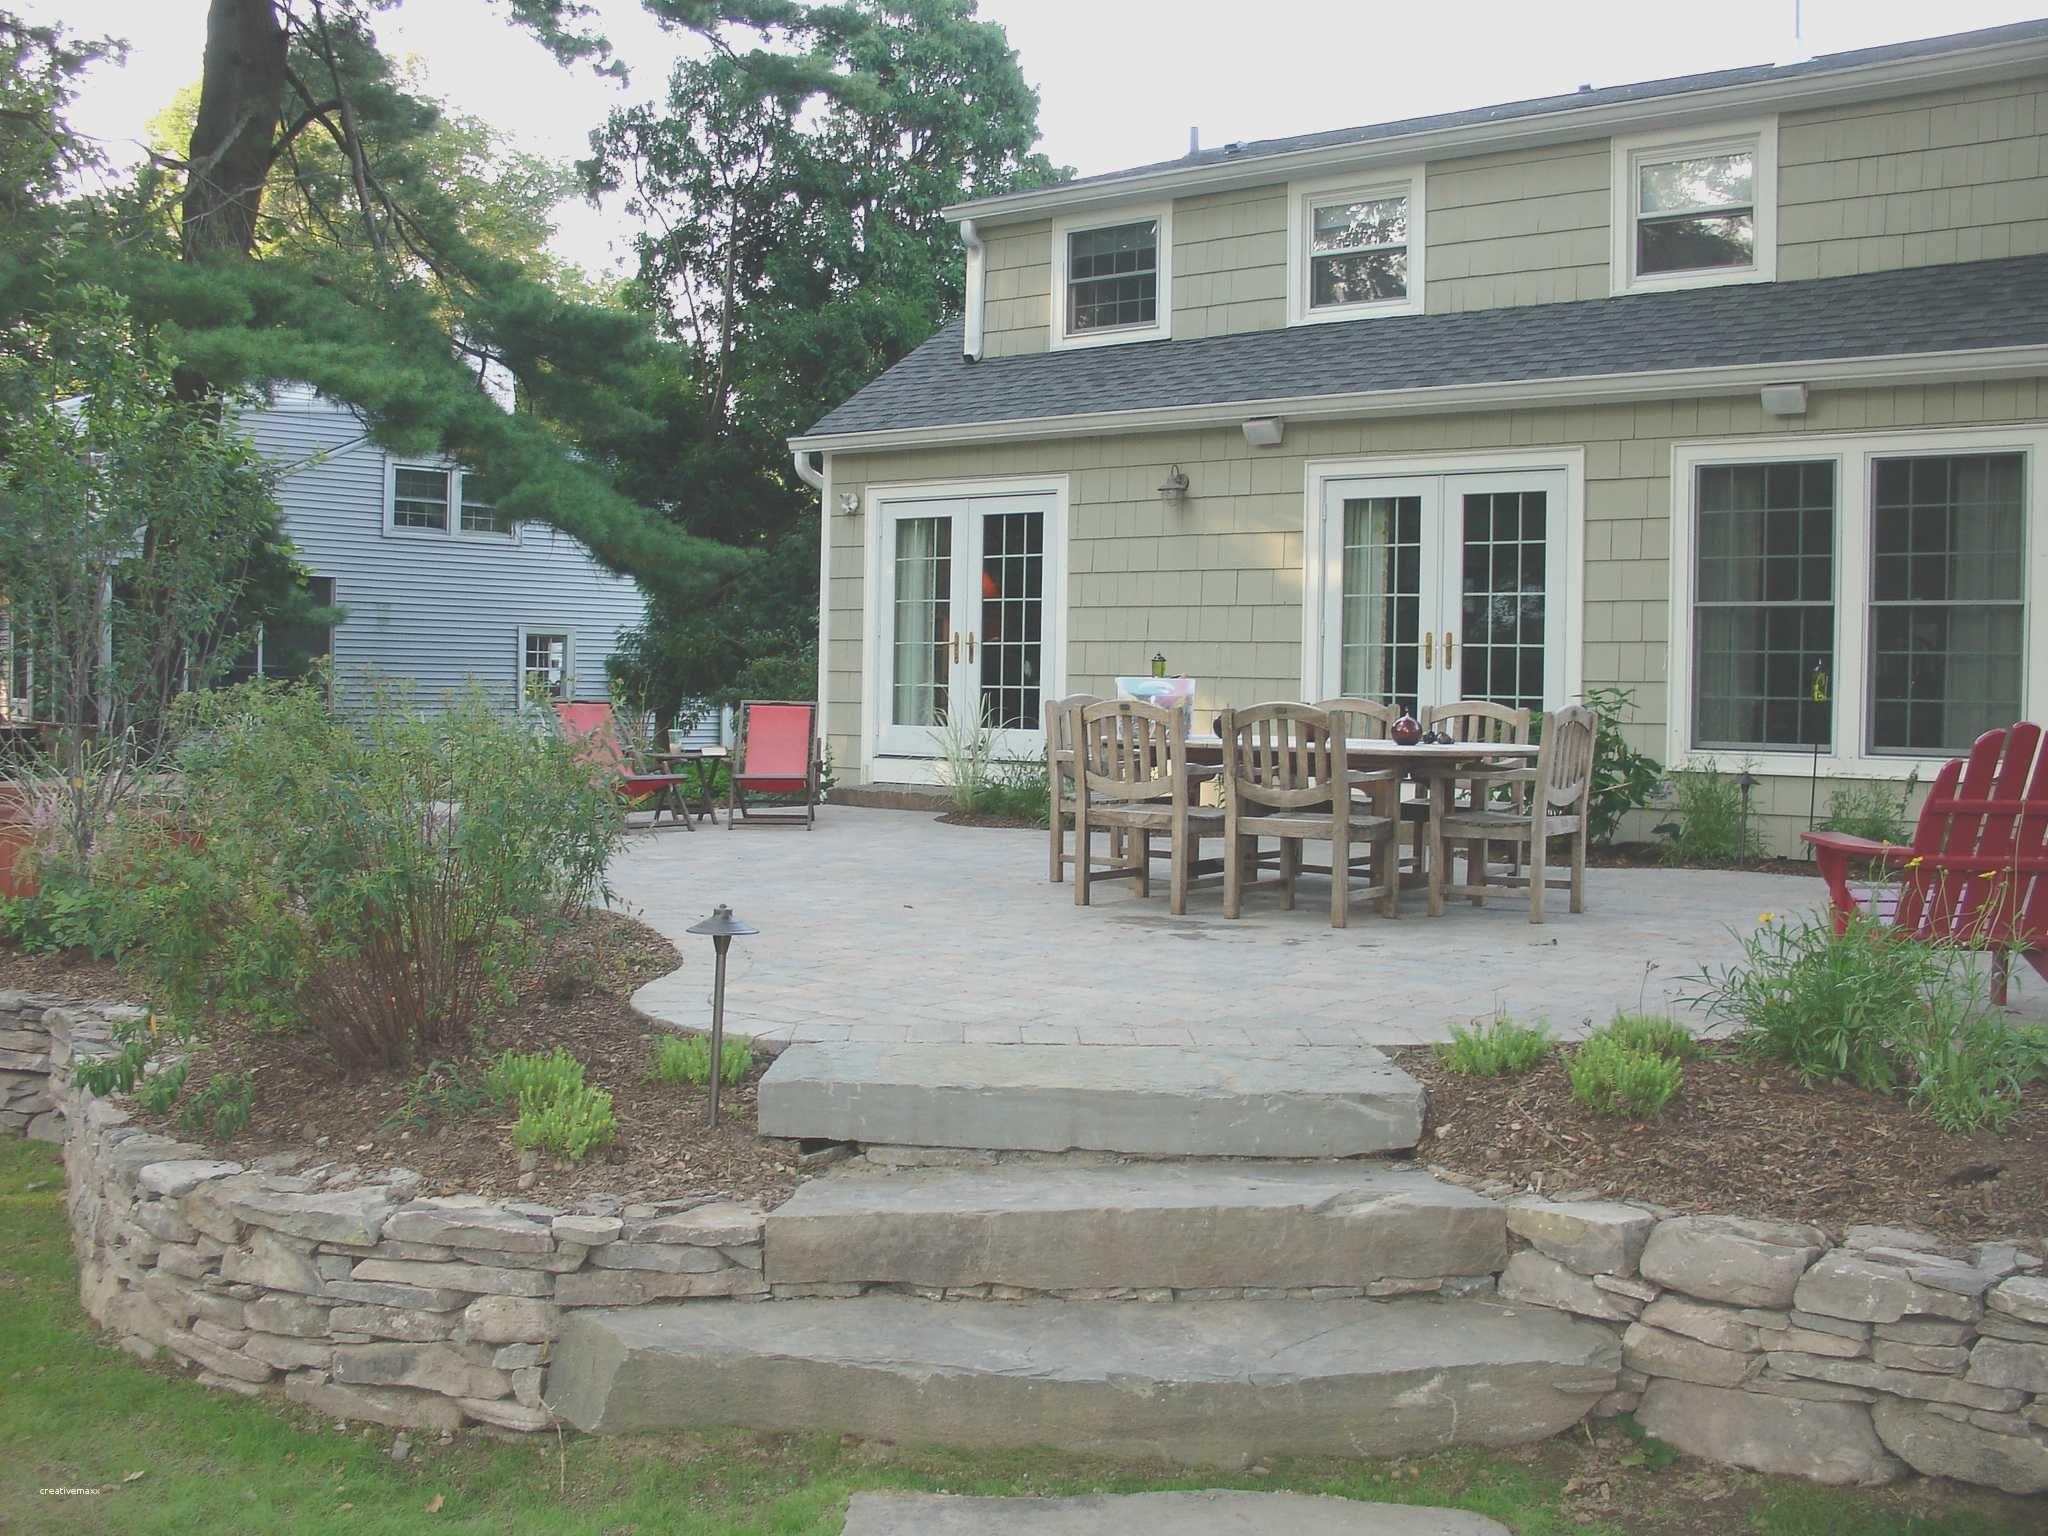 Backyard Concrete Retaining Wall Ideas Cement Landscape Design Unique Decor Tips Backyard Design With Concrete Pa Raised Patio Patio Landscaping Patio Garden